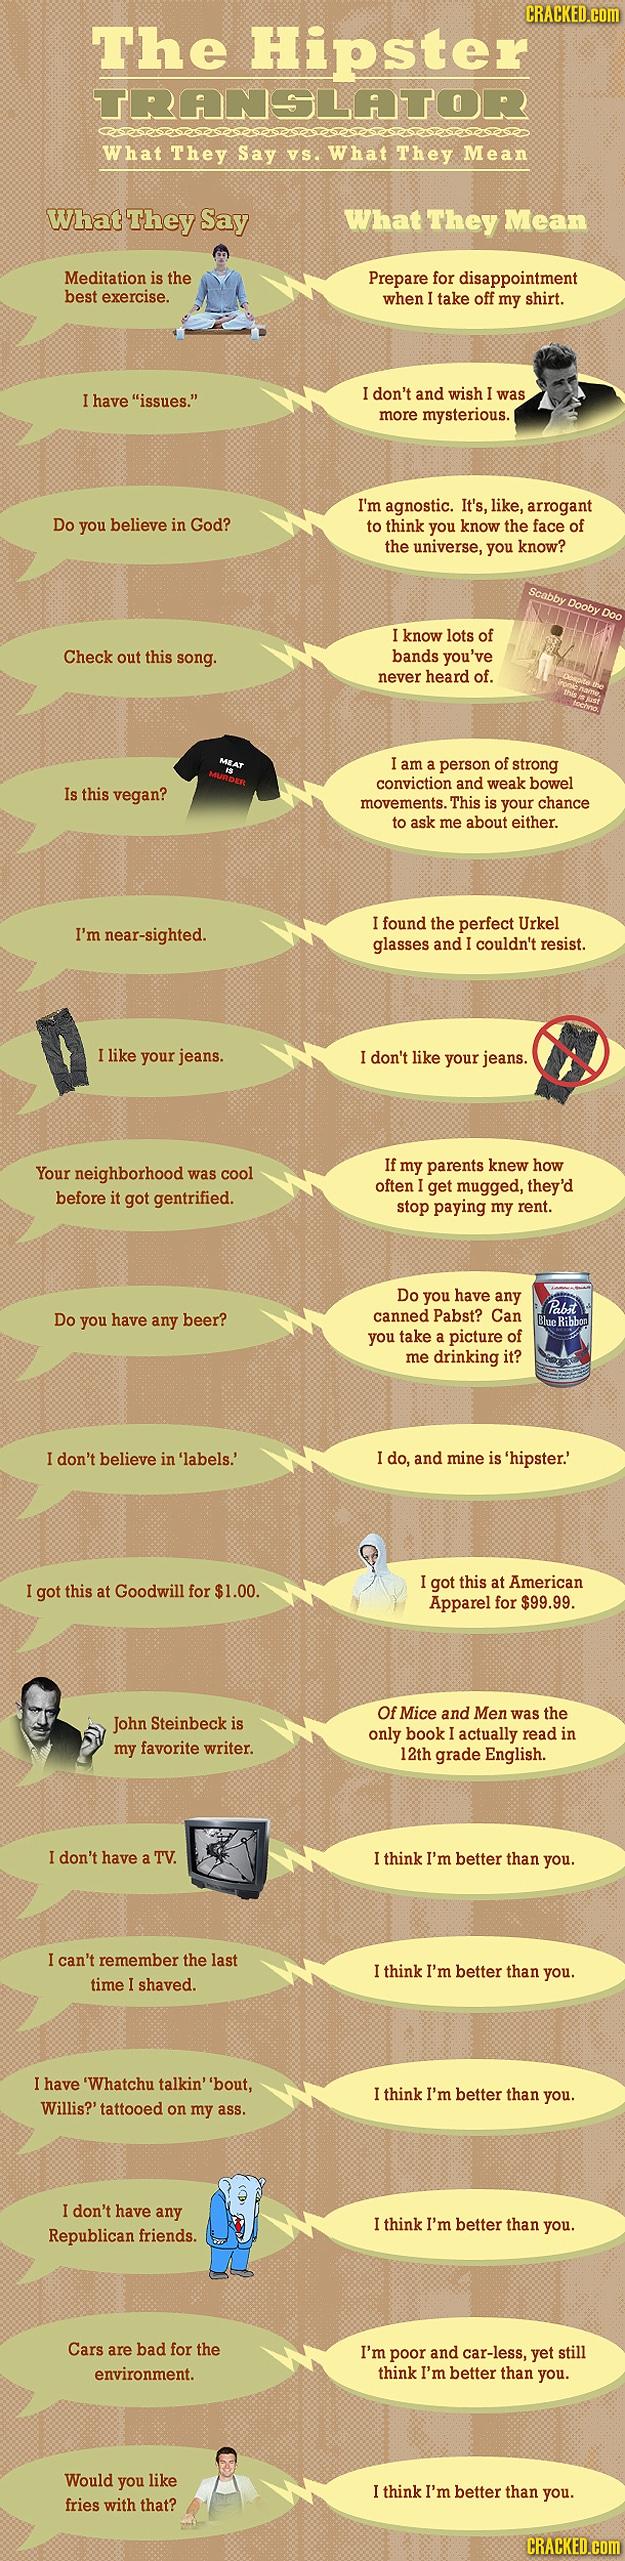 Hipster-Style-Translator-Personality-Chart